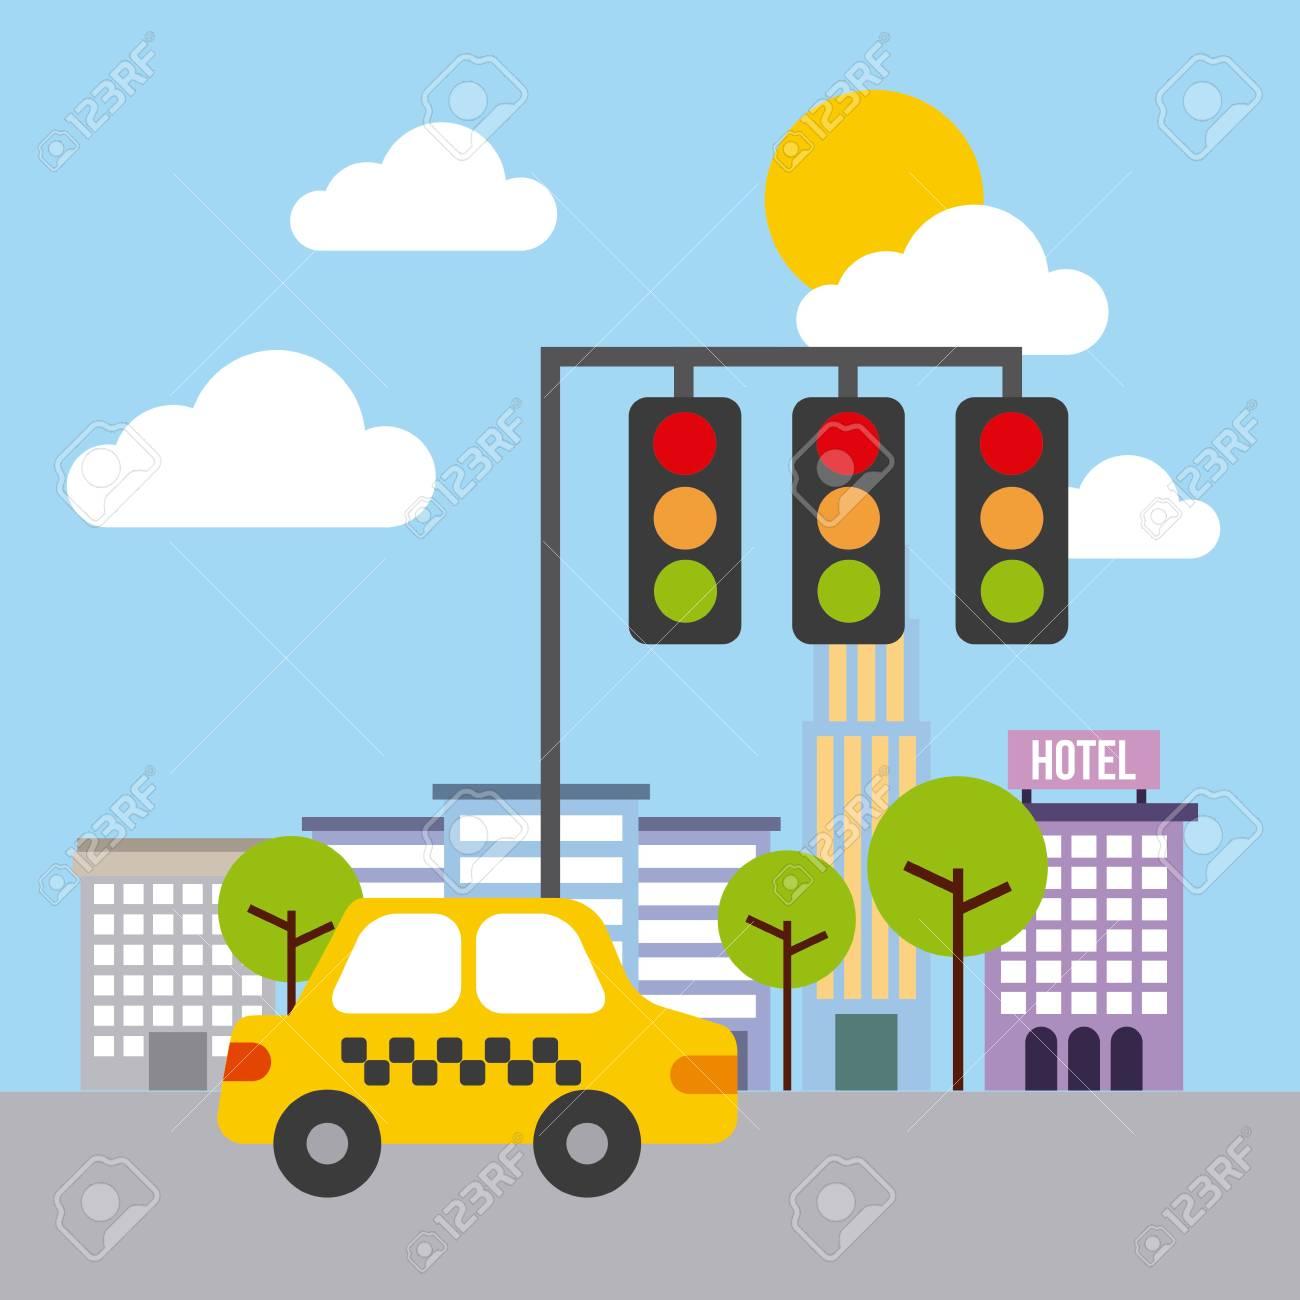 89c90848b9 street urban city building structure traffic vector illustration Stock  Vector - 85726207